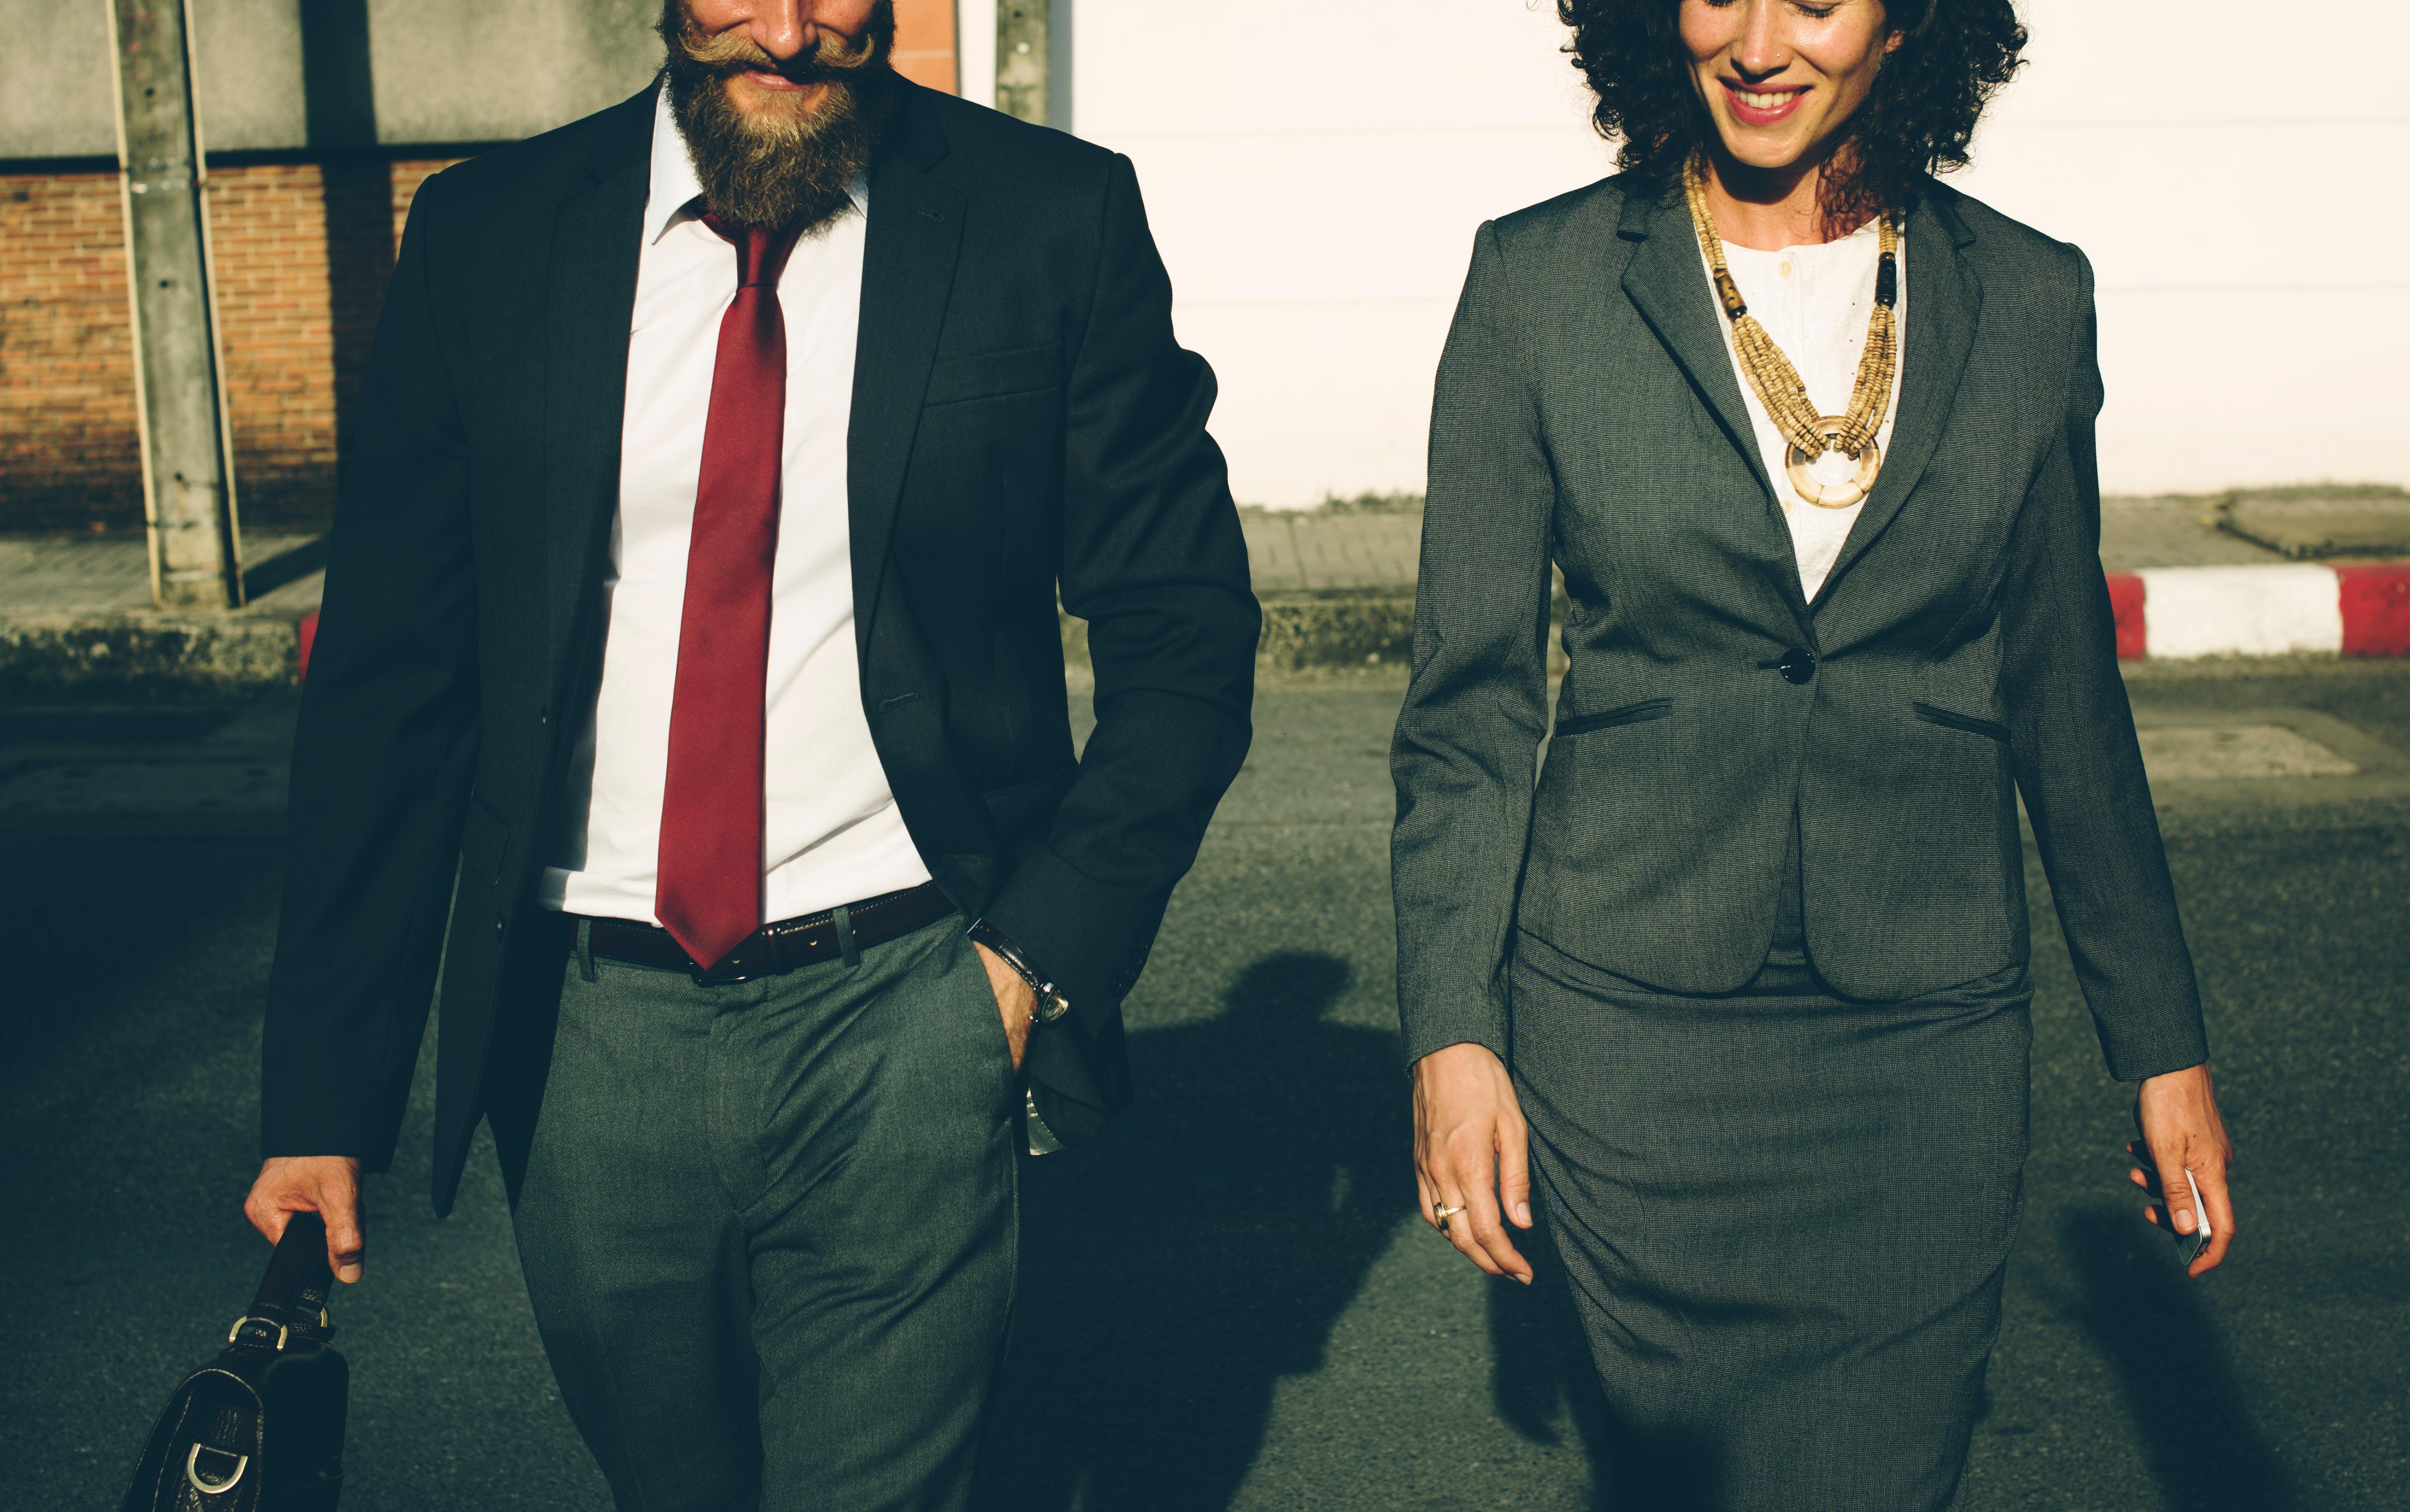 Who's Who? Temp Agencies vs. Freelance Marketplaces